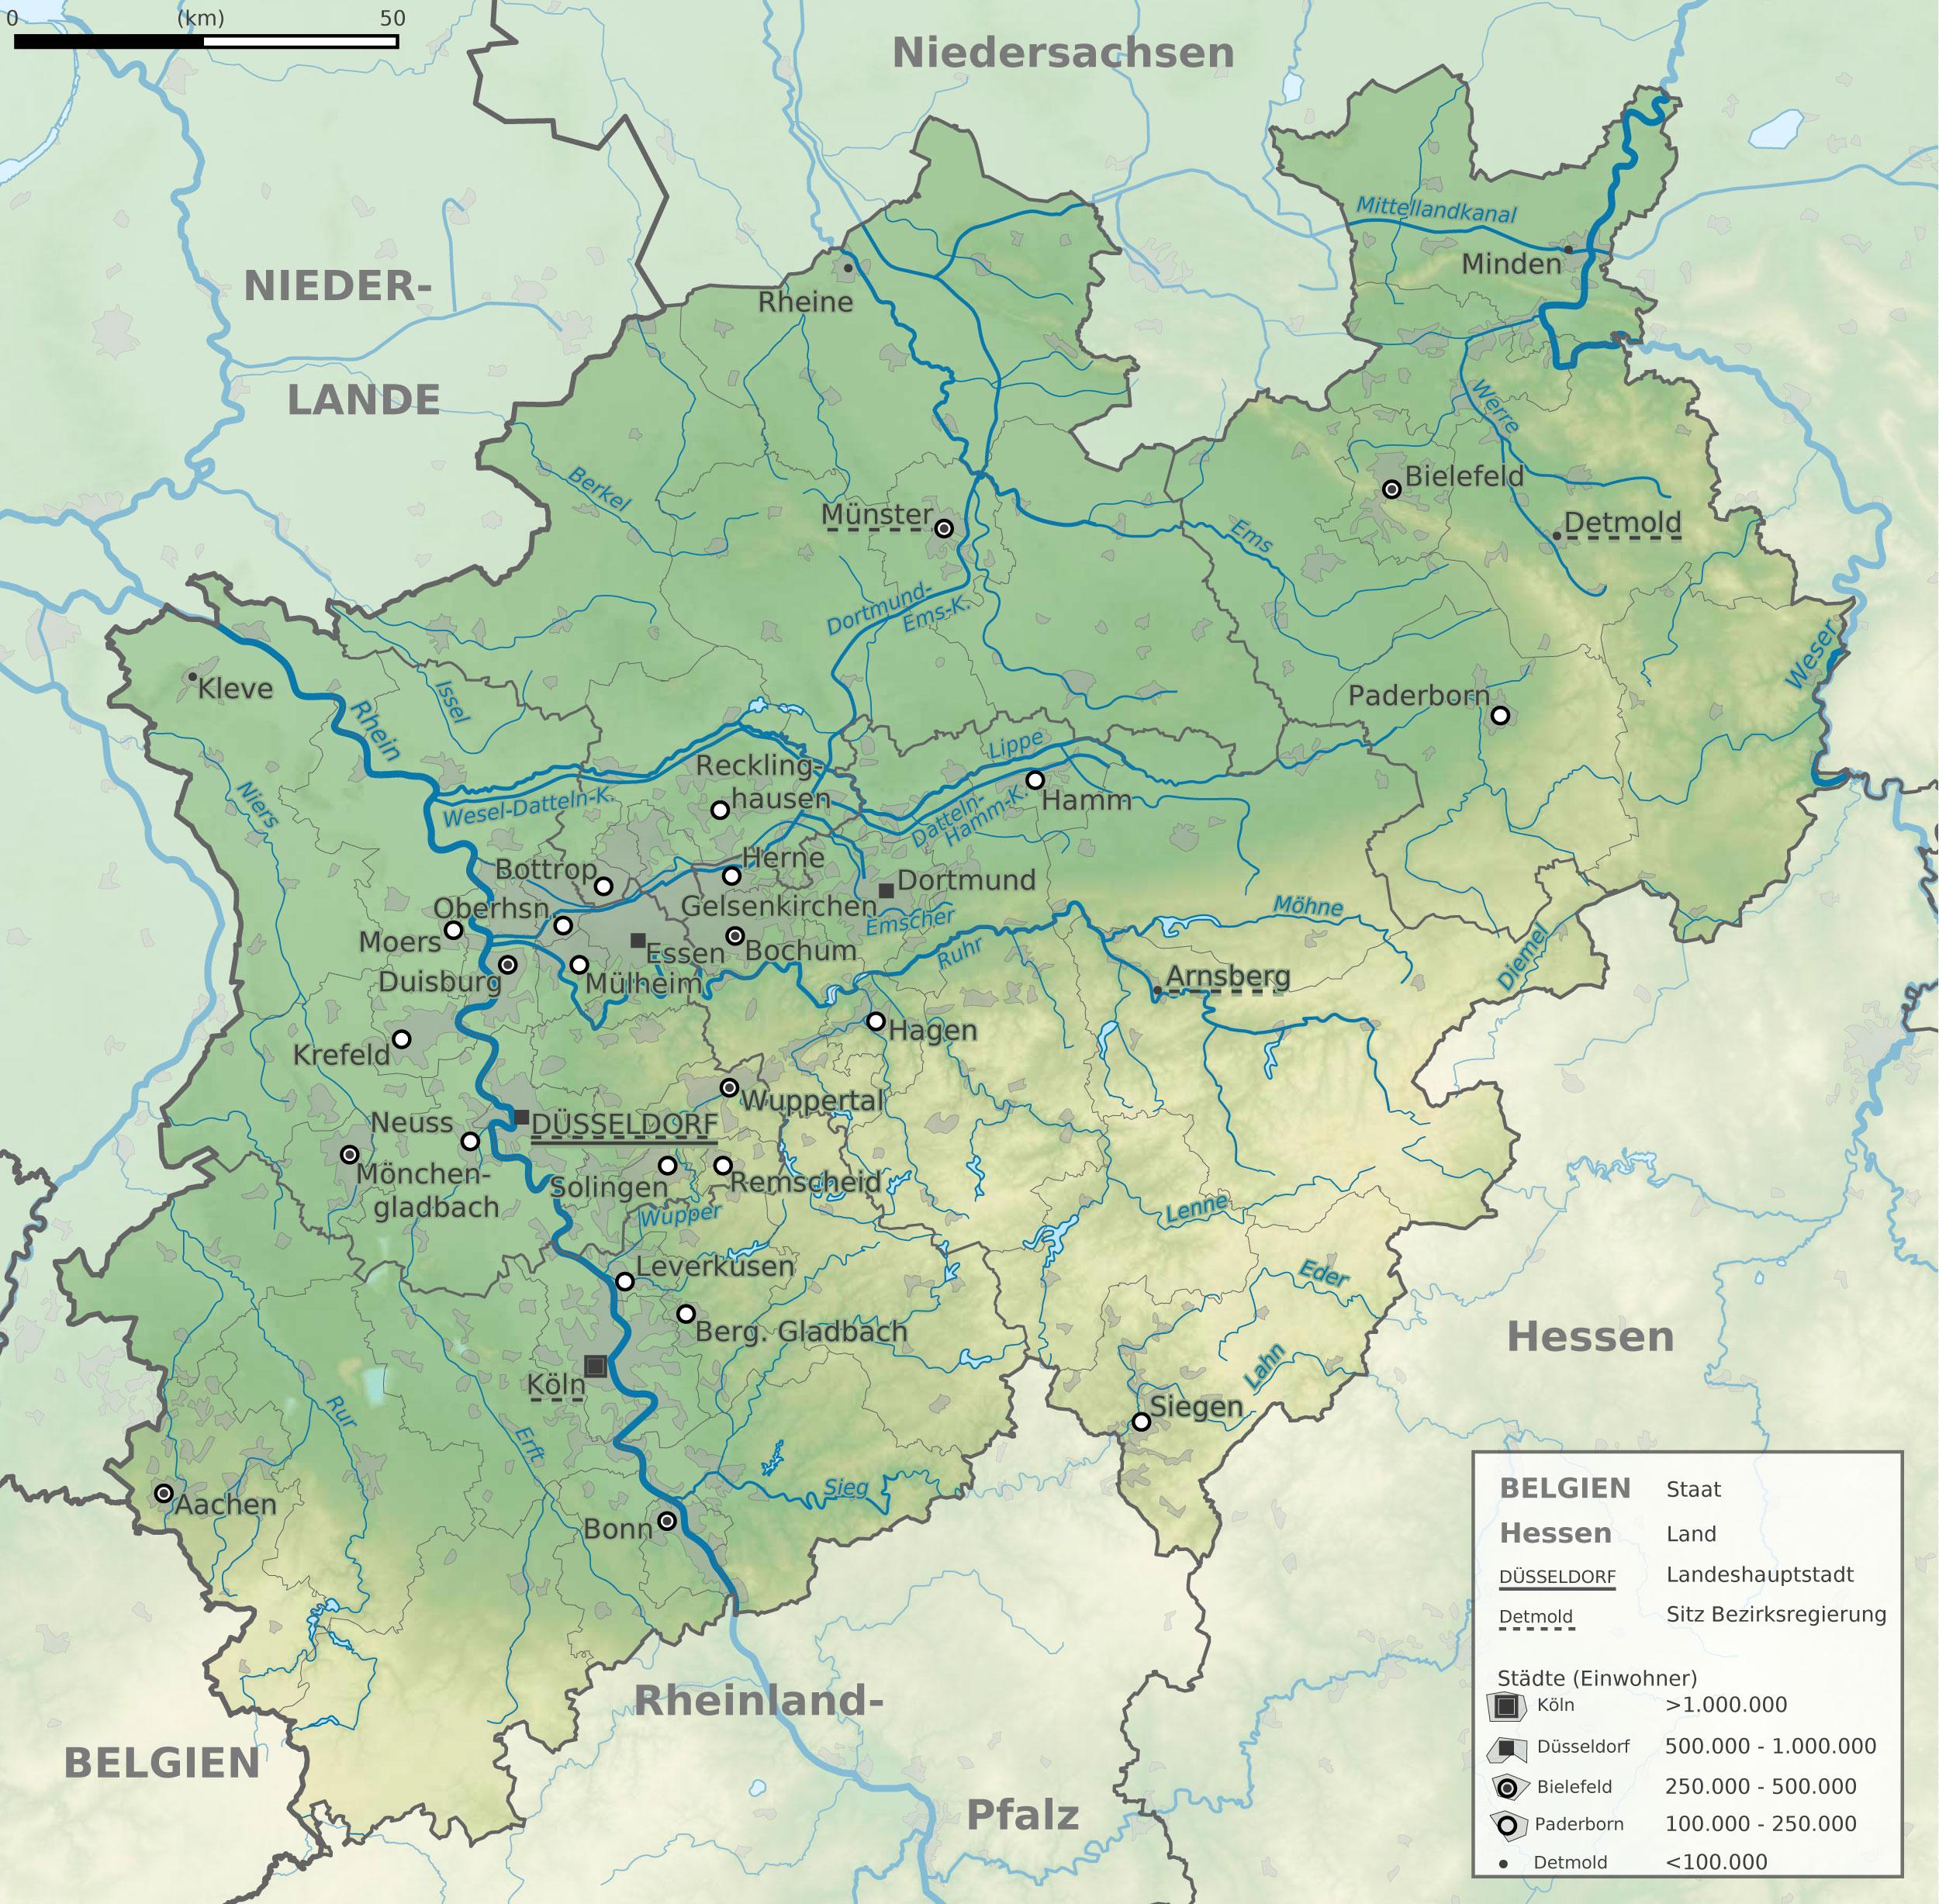 germany political system essay